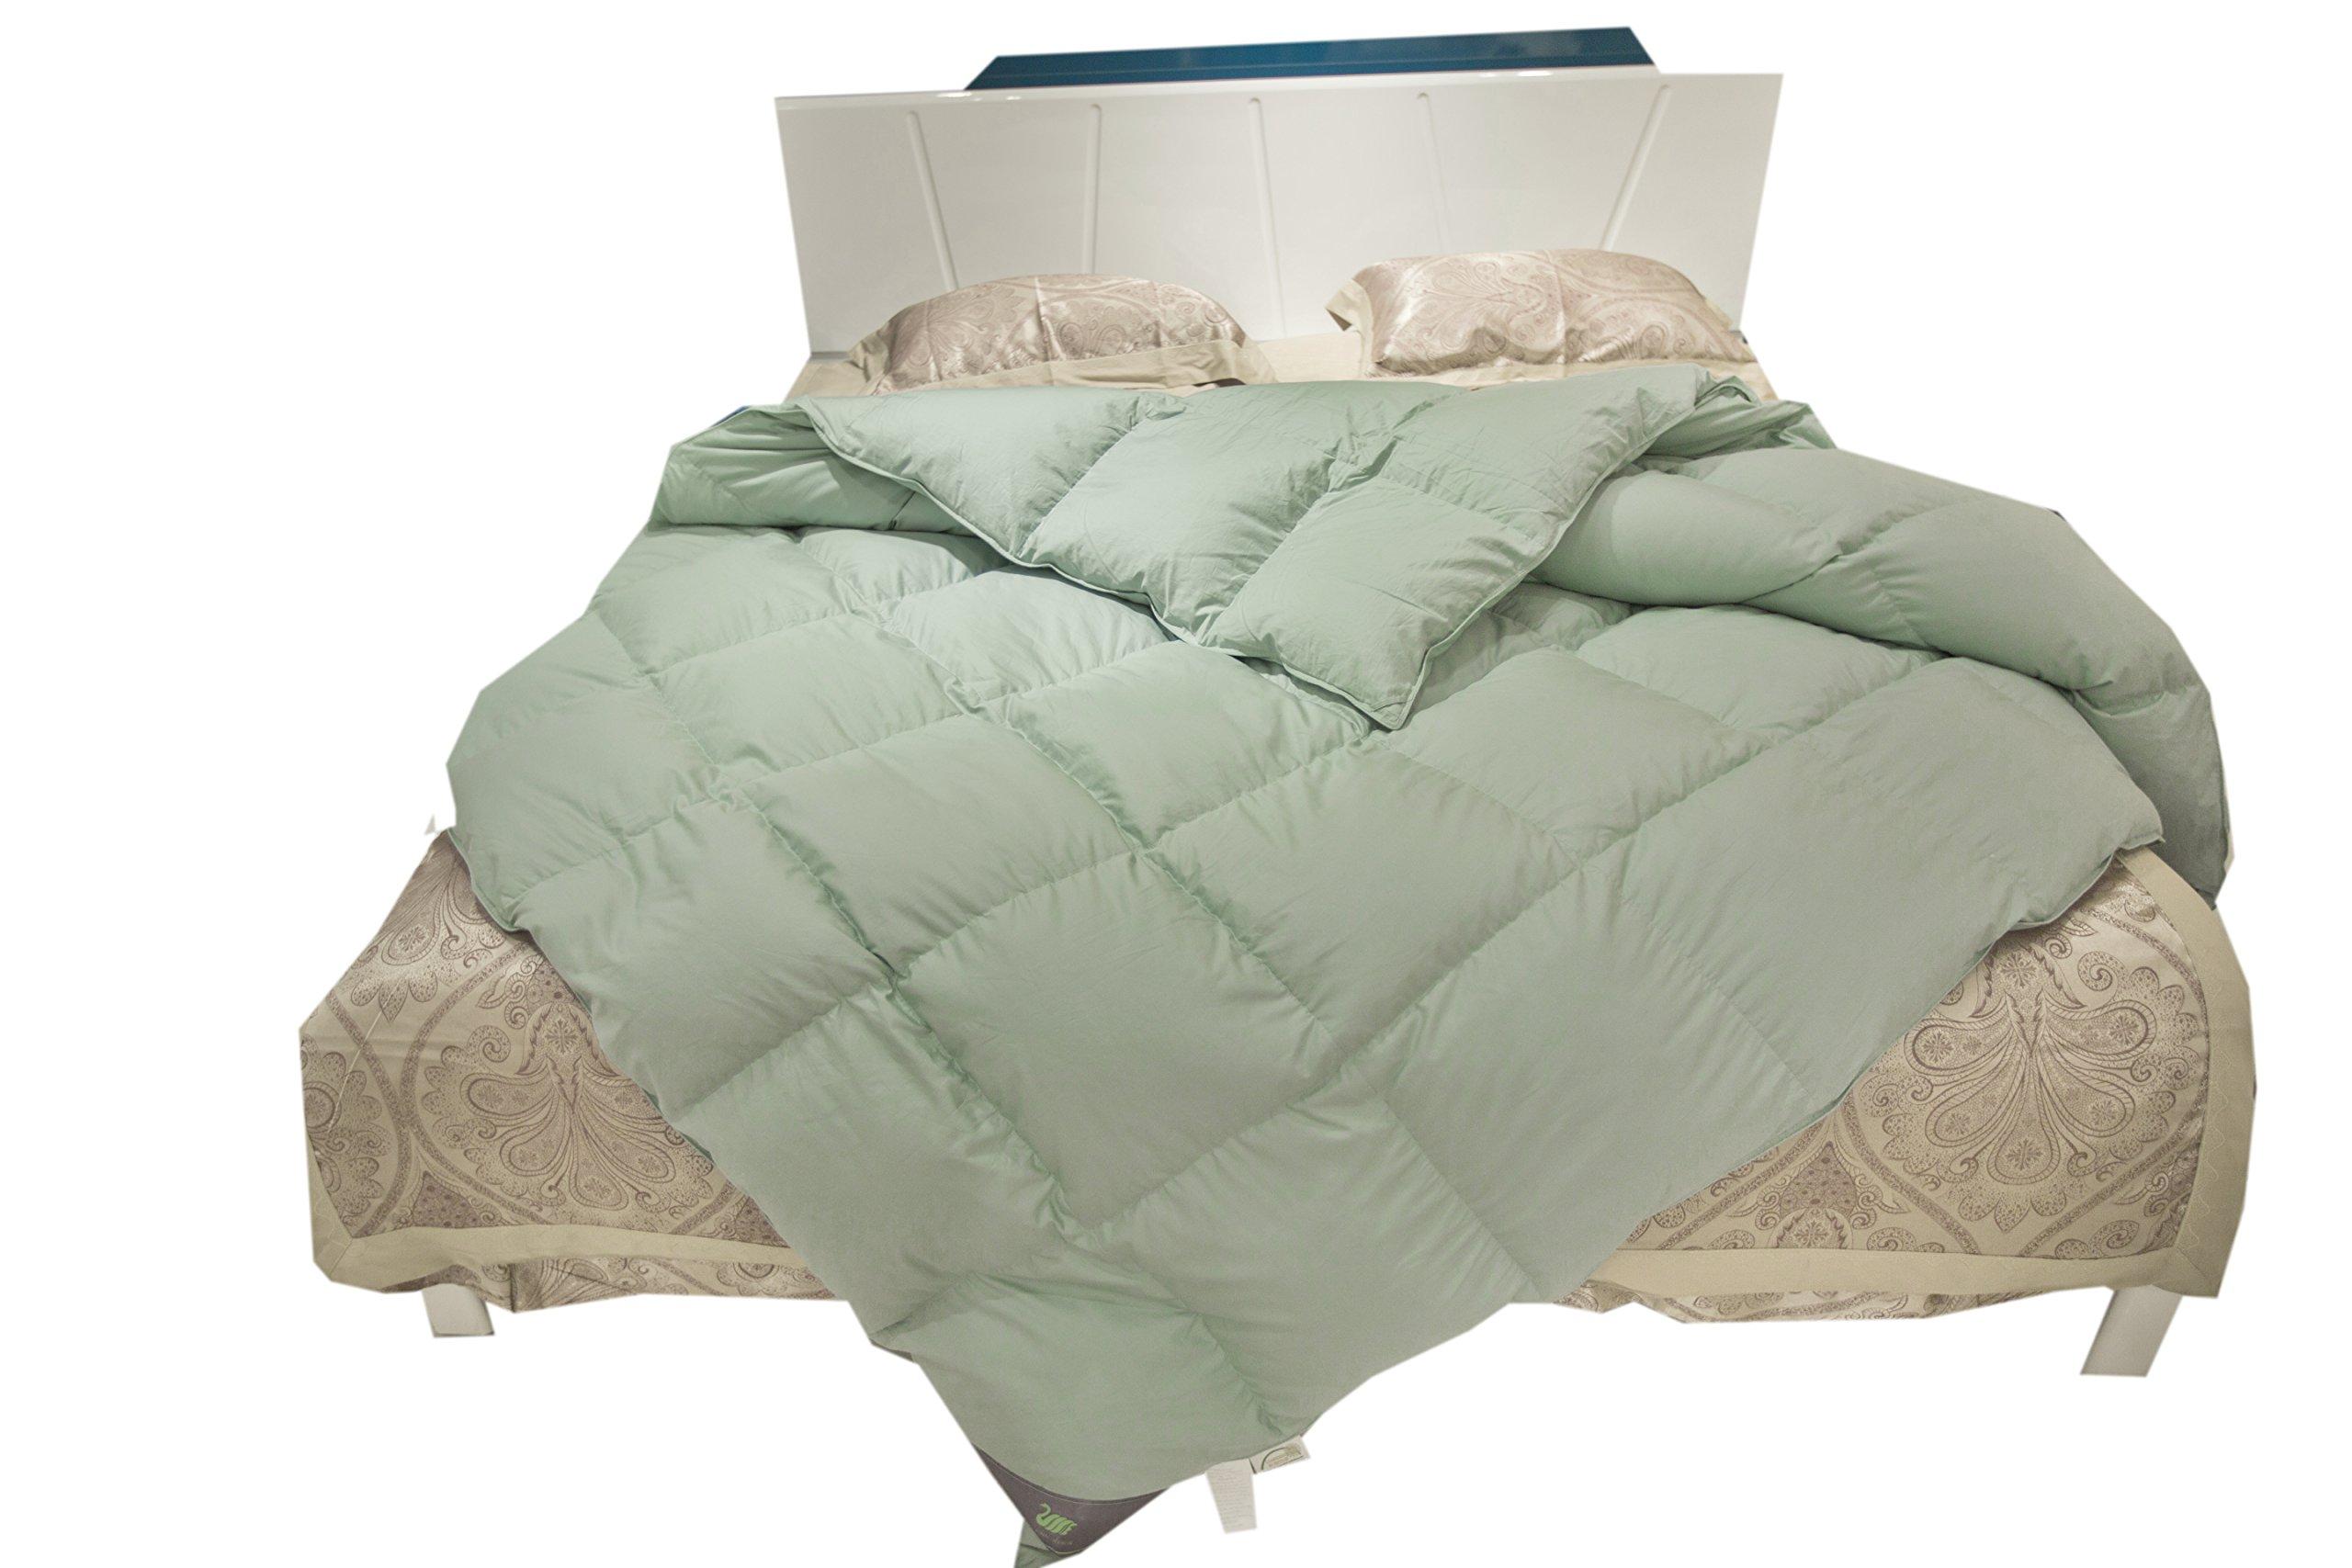 Toddler/Travel/Crib Goose Down Comforter Duvet/Blanket, 100% ORGANIC Cotton Unisex kids, ALL SEASON, Lake Blue 33x44